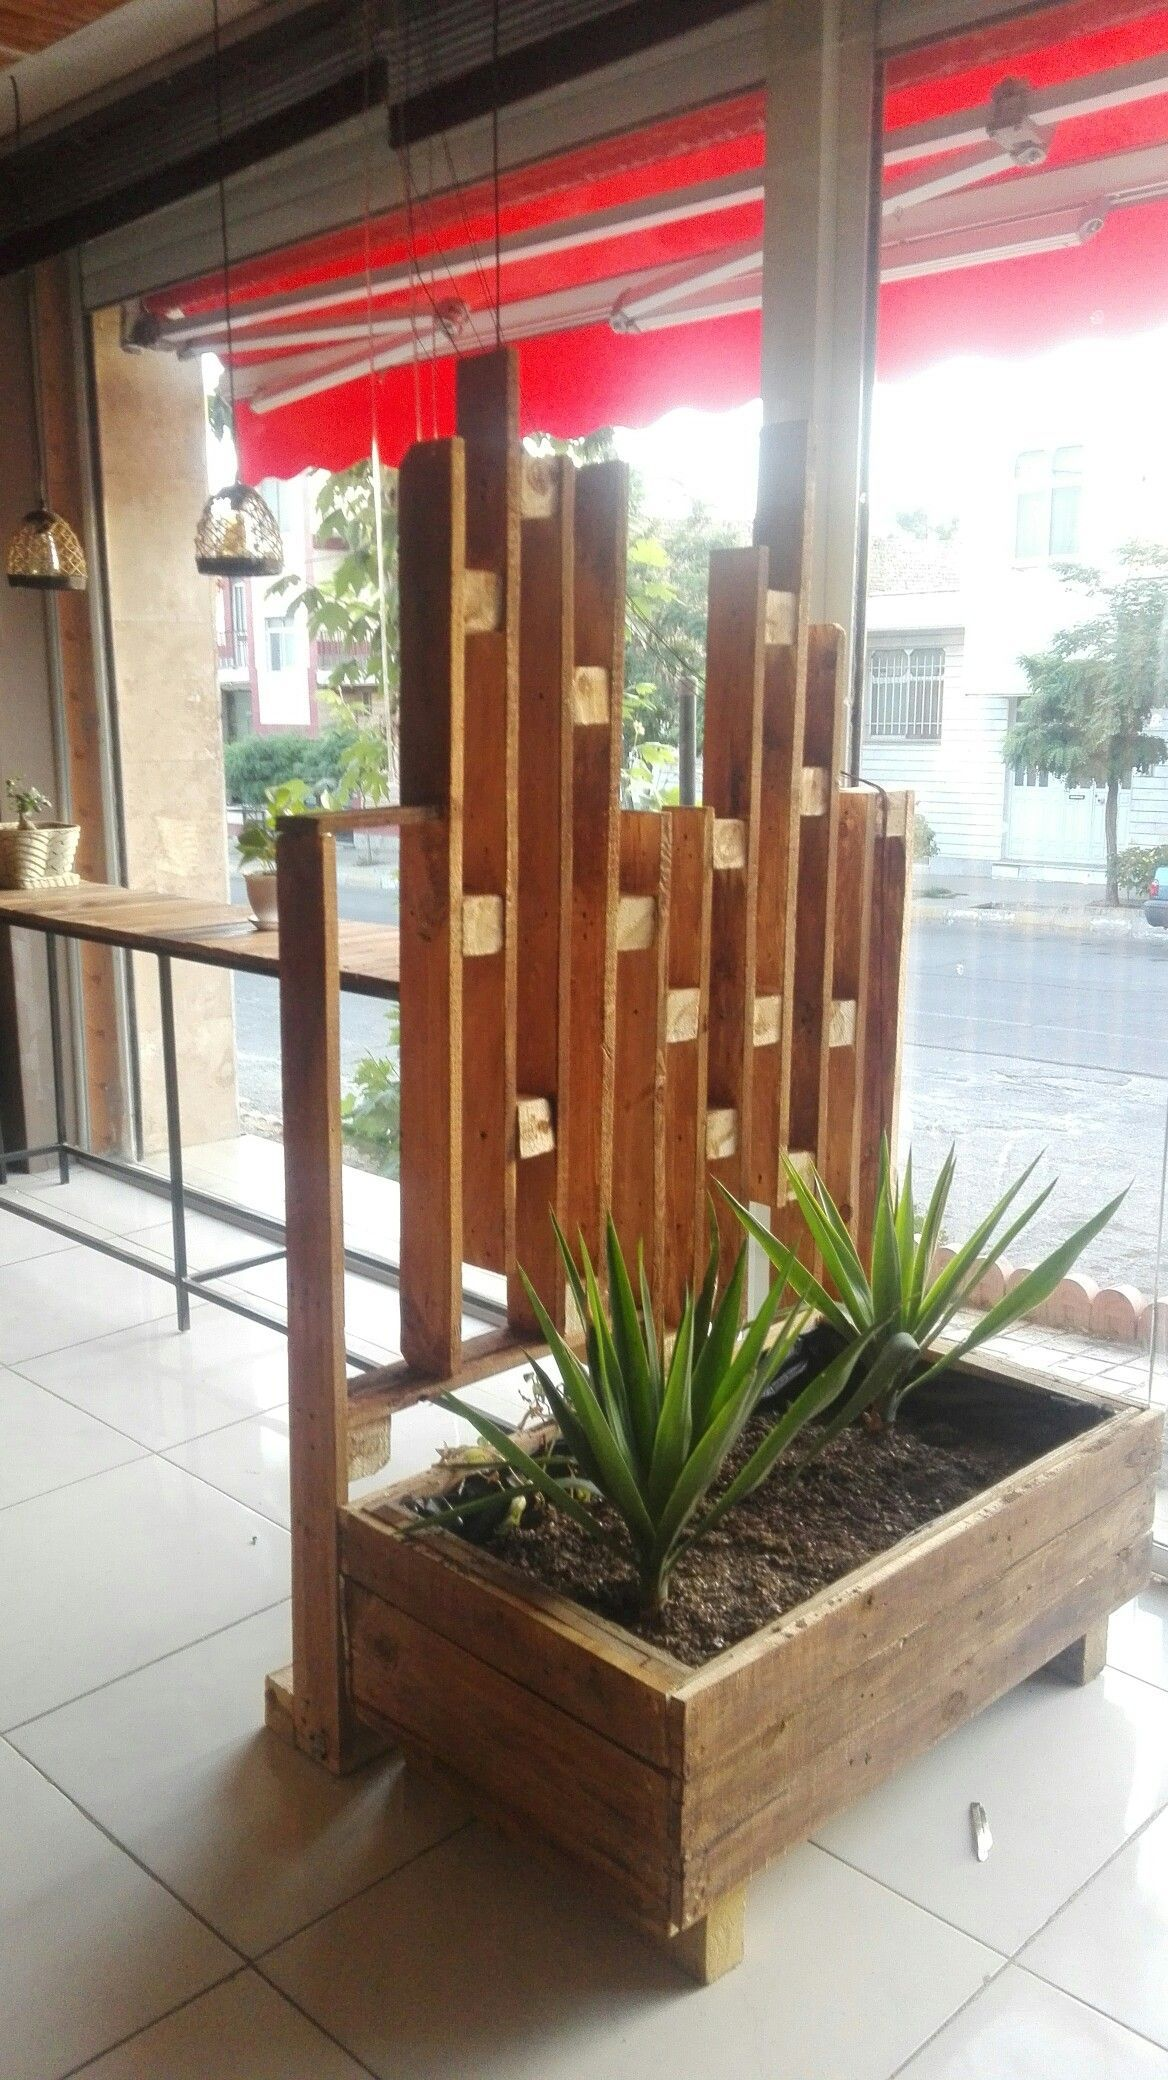 Coffe shop ideas divider pallet woodworking استفاده از پالت و چسب و